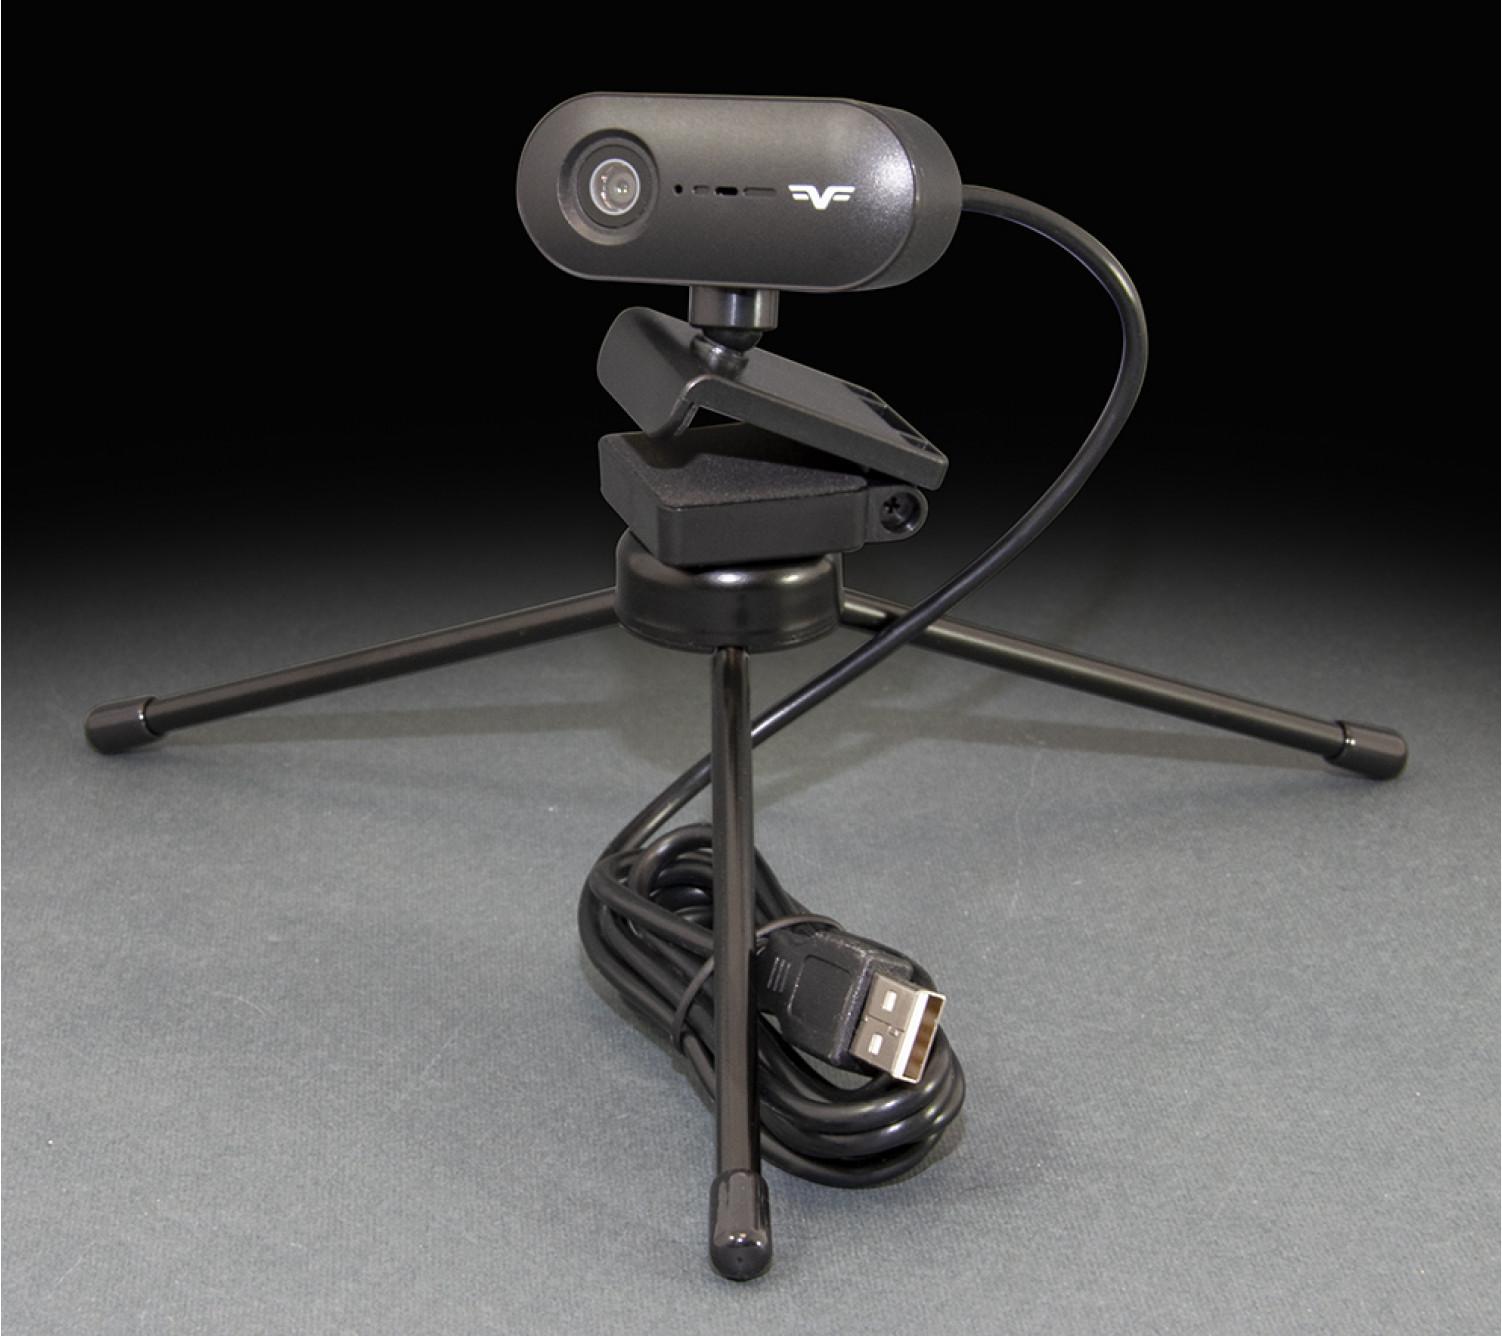 Веб-камера с триподом Frime FWC-007A FHD